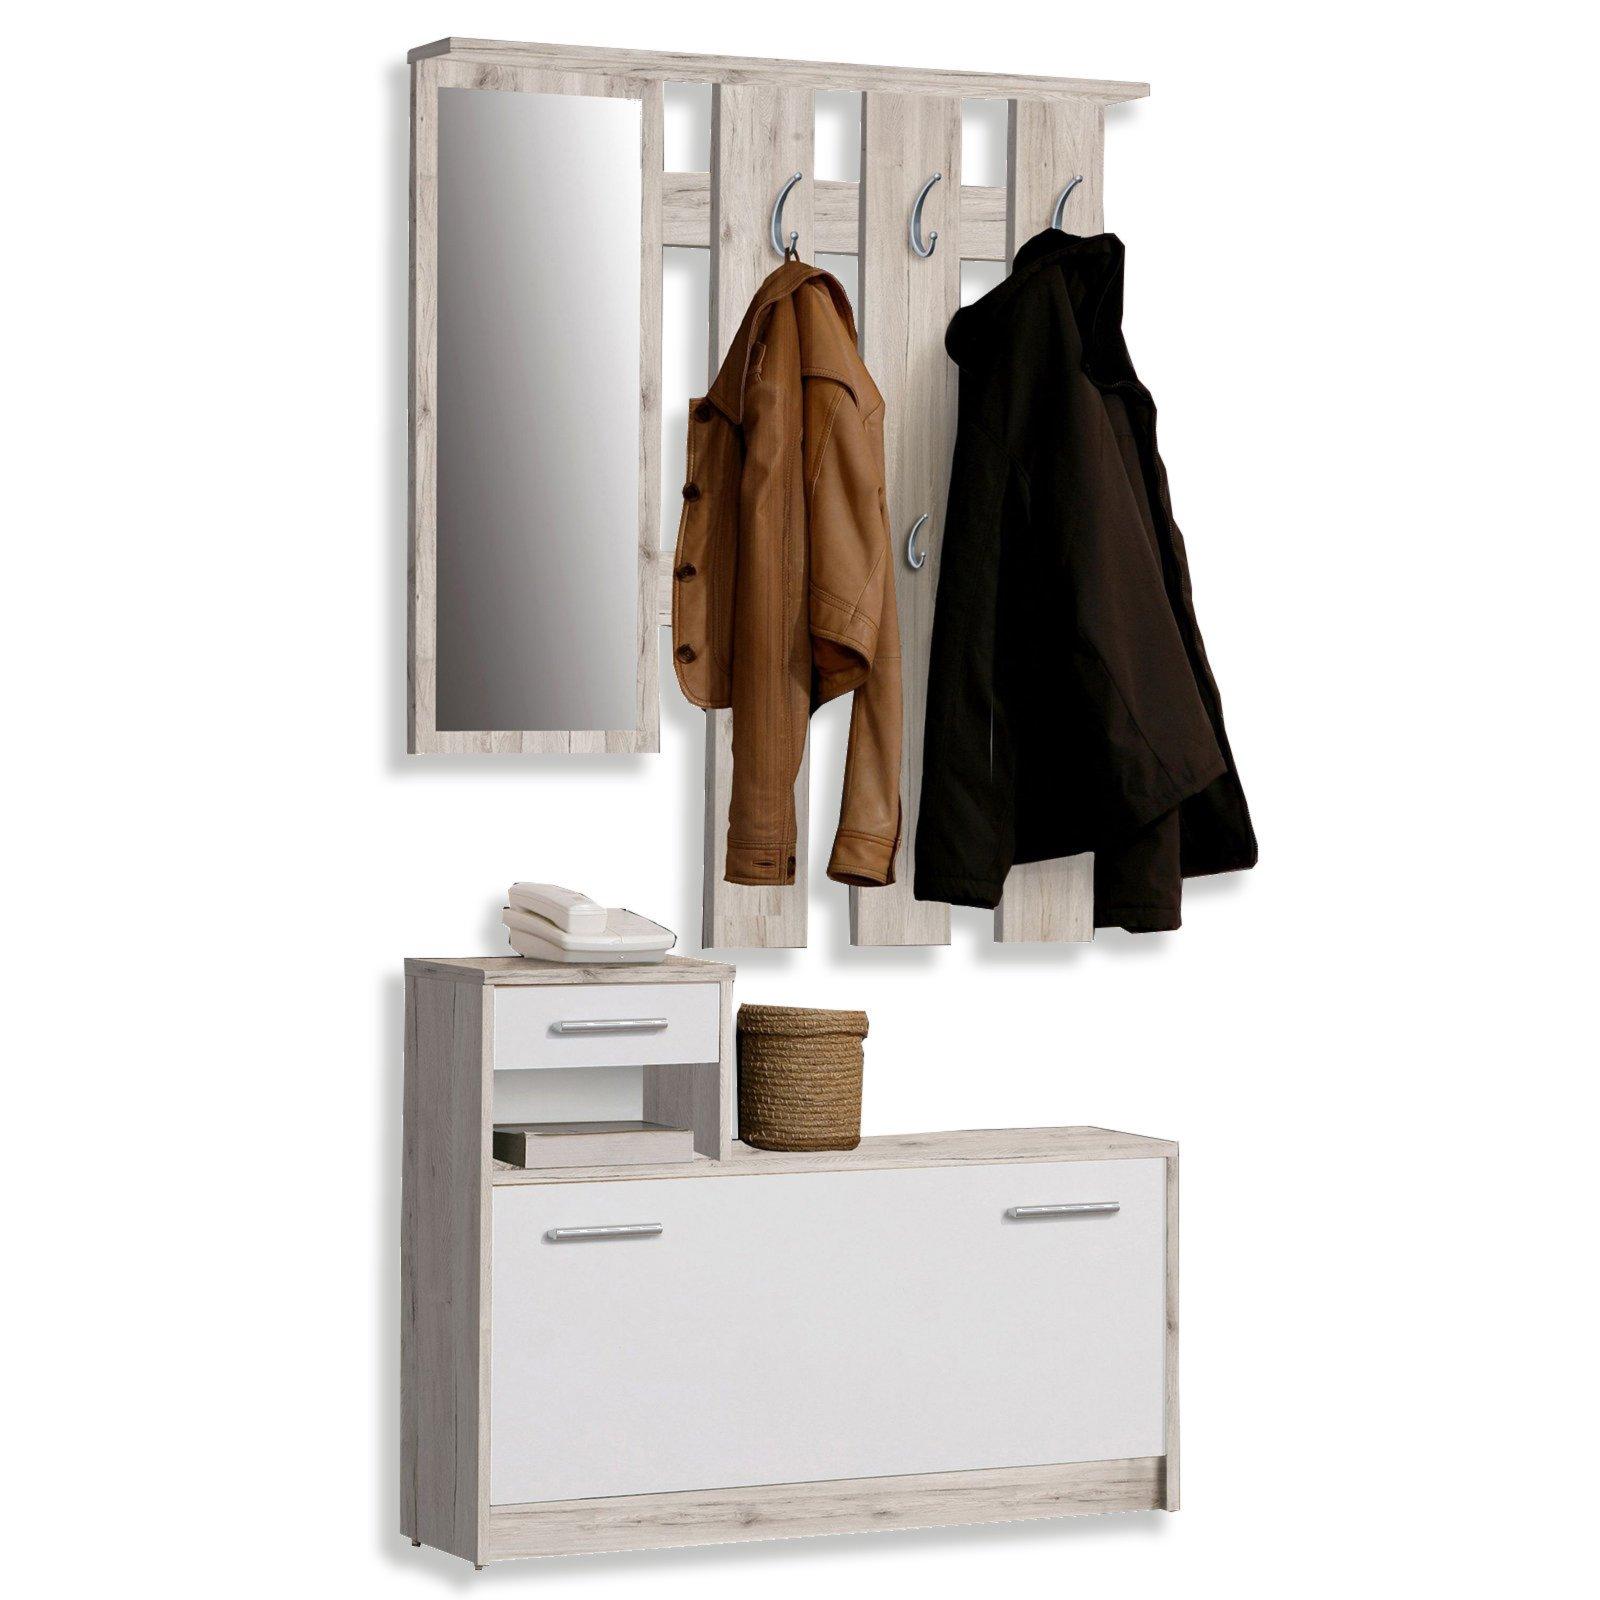 roller garderobe foxi sandeiche 98 cm breite ebay. Black Bedroom Furniture Sets. Home Design Ideas